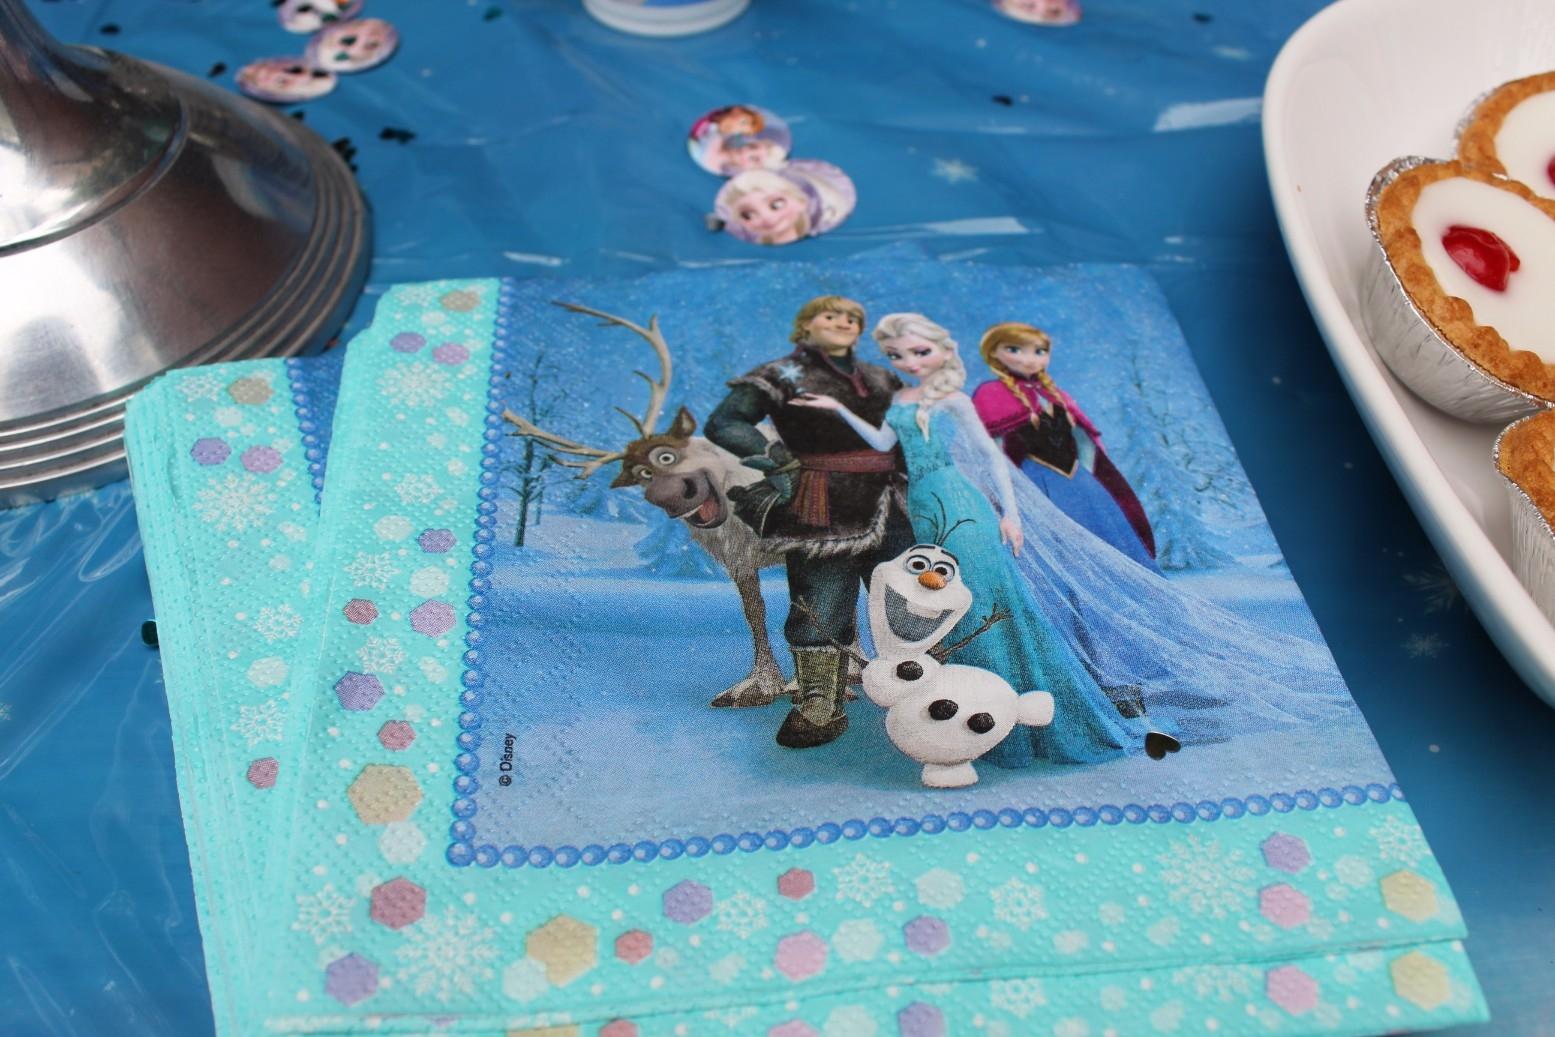 Disney Store Frozen Party Accessories (4)